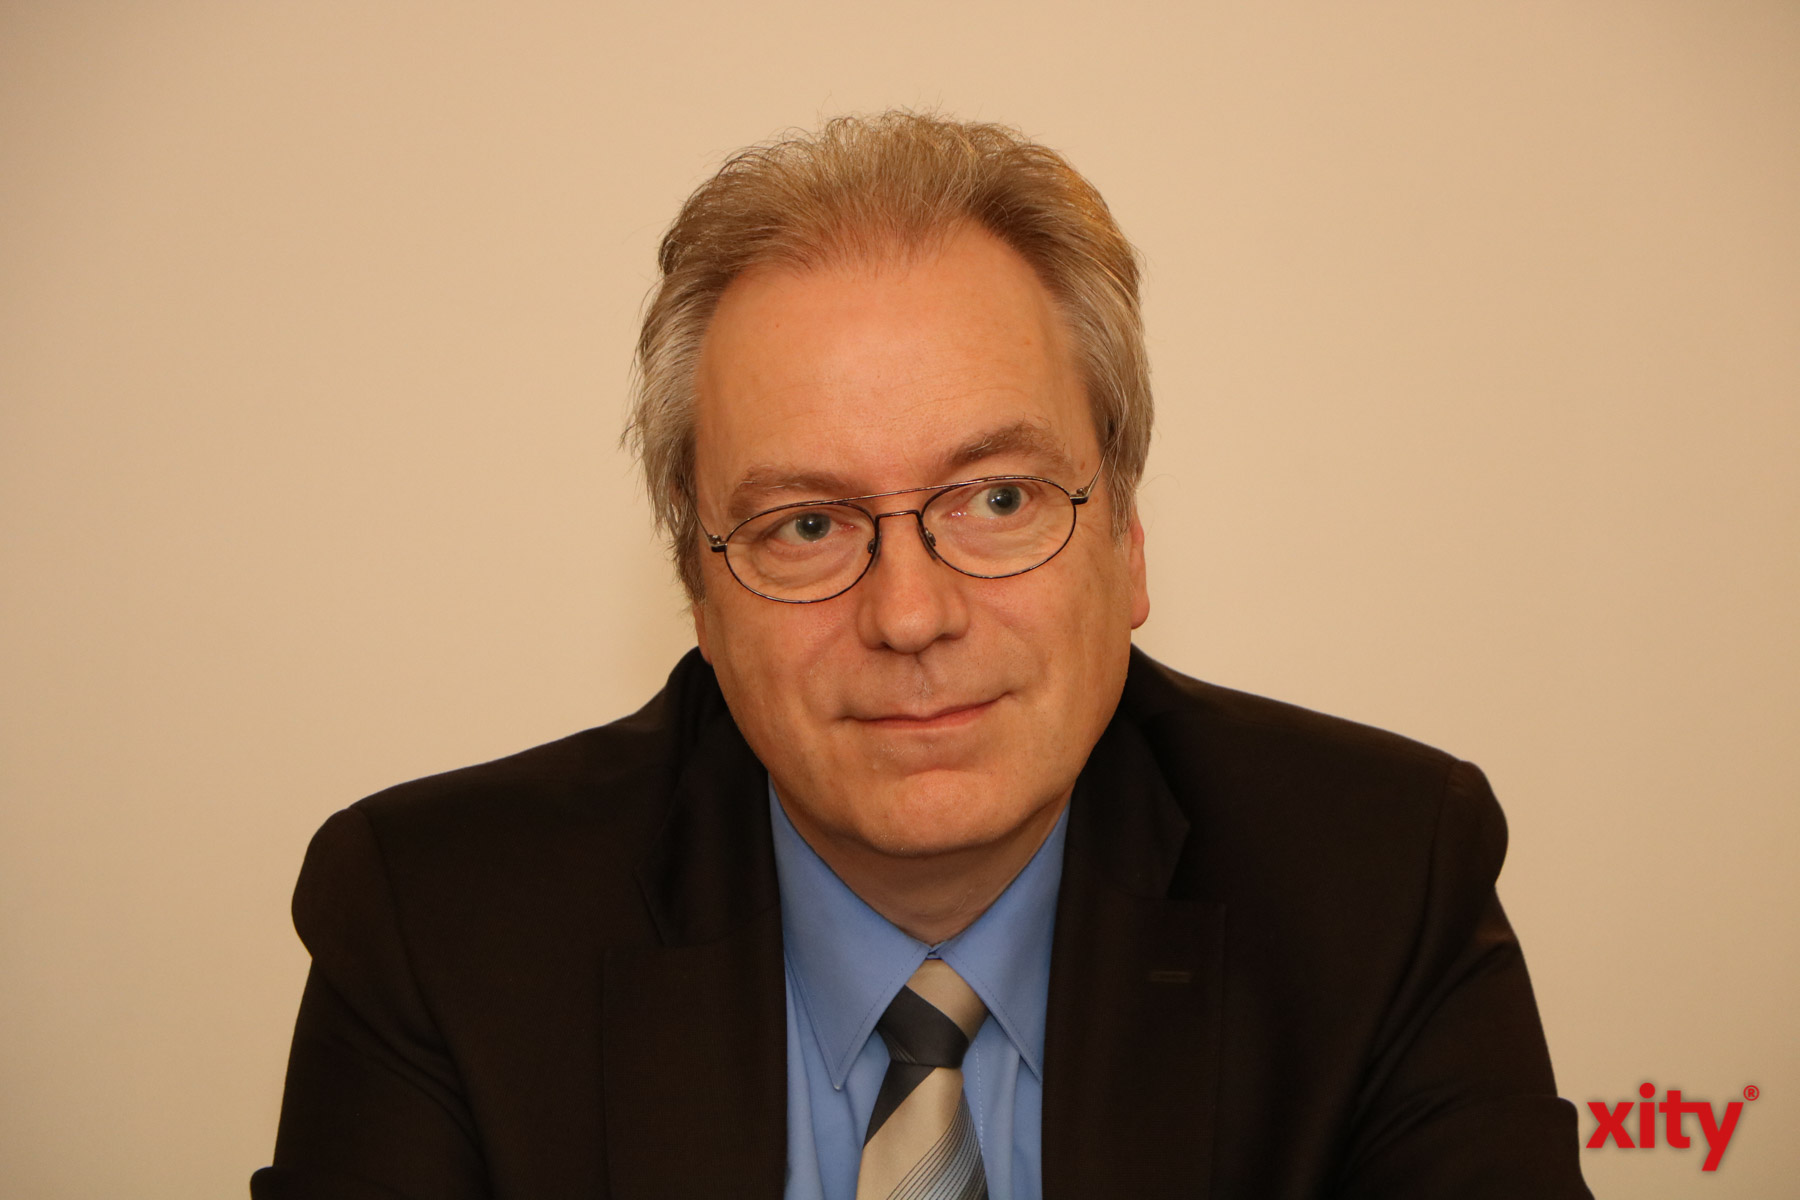 Rüdiger Gutt, Fraktionsvorsitzender der CDU im Düsseldorfer Stadtrat (Foto: xity)